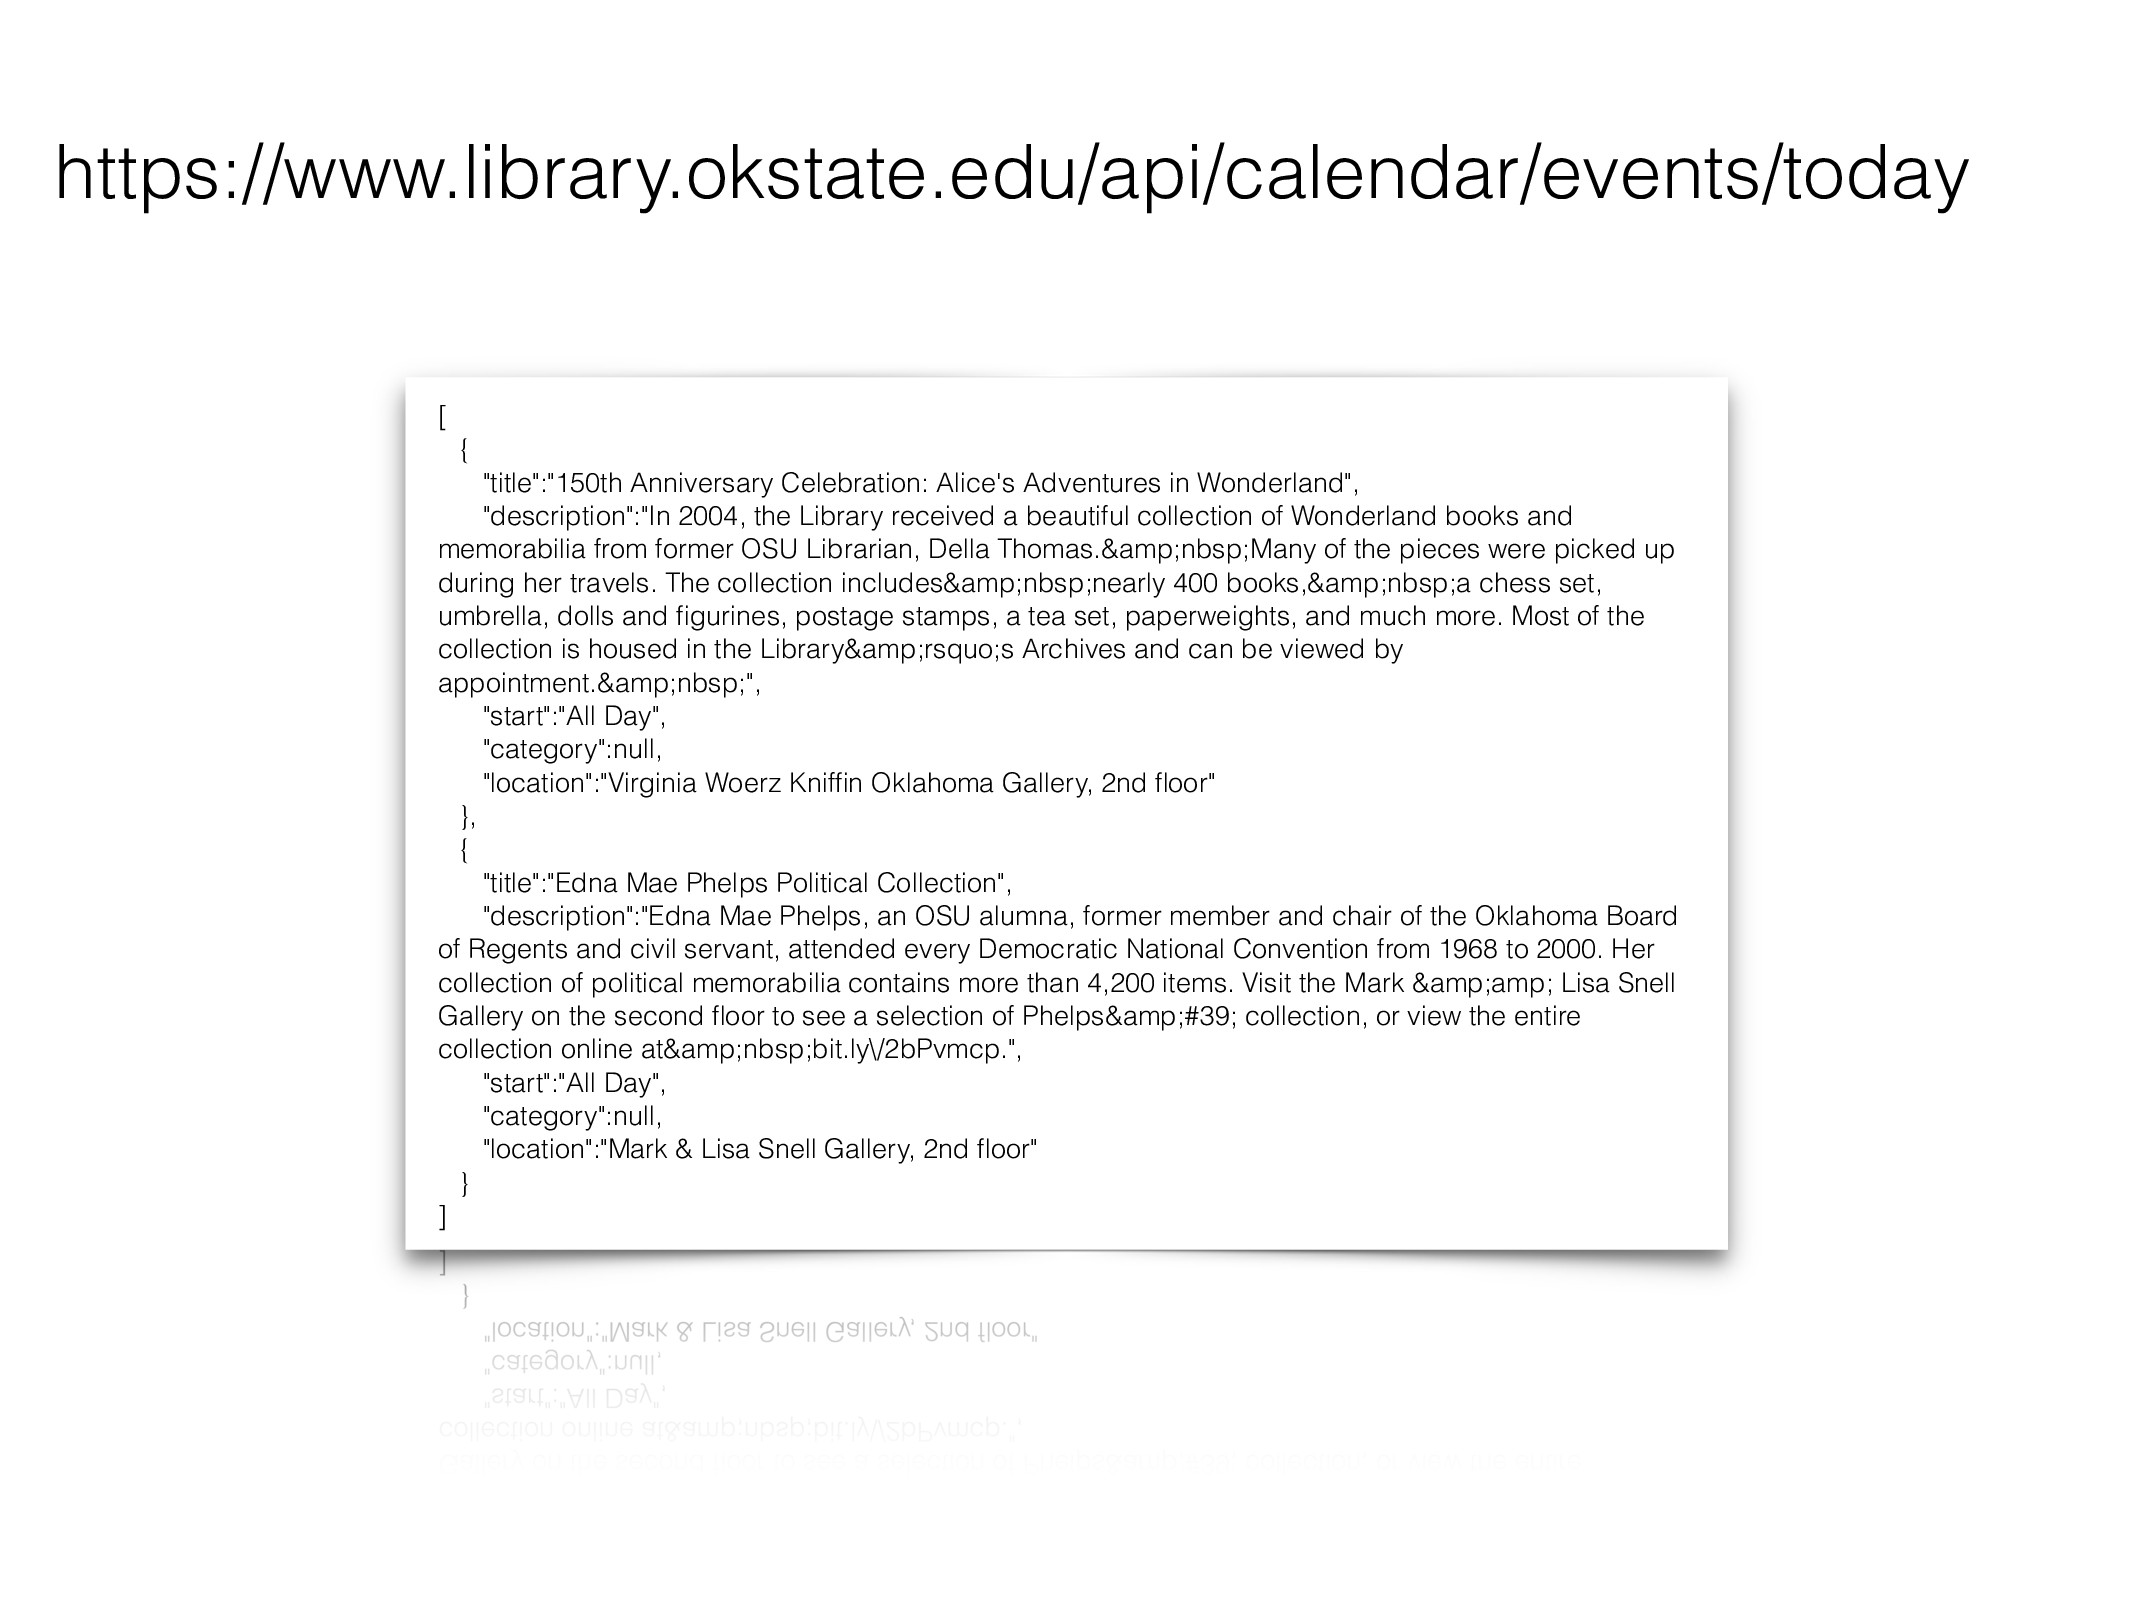 https://www.library.okstate.edu/api/calendar/ev...